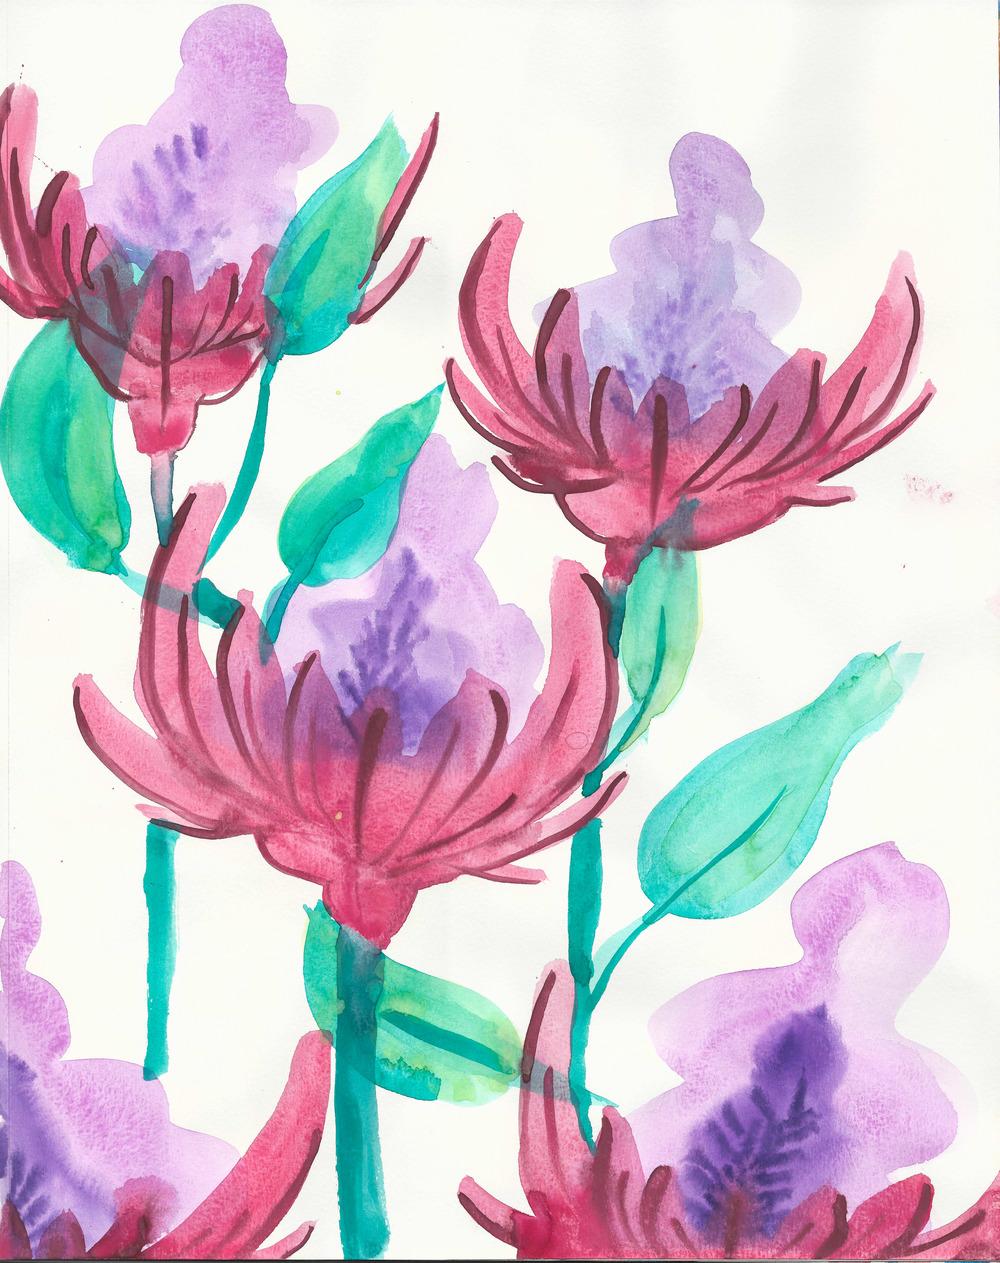 watercolor jungle flowers 11x14 paper.jpg